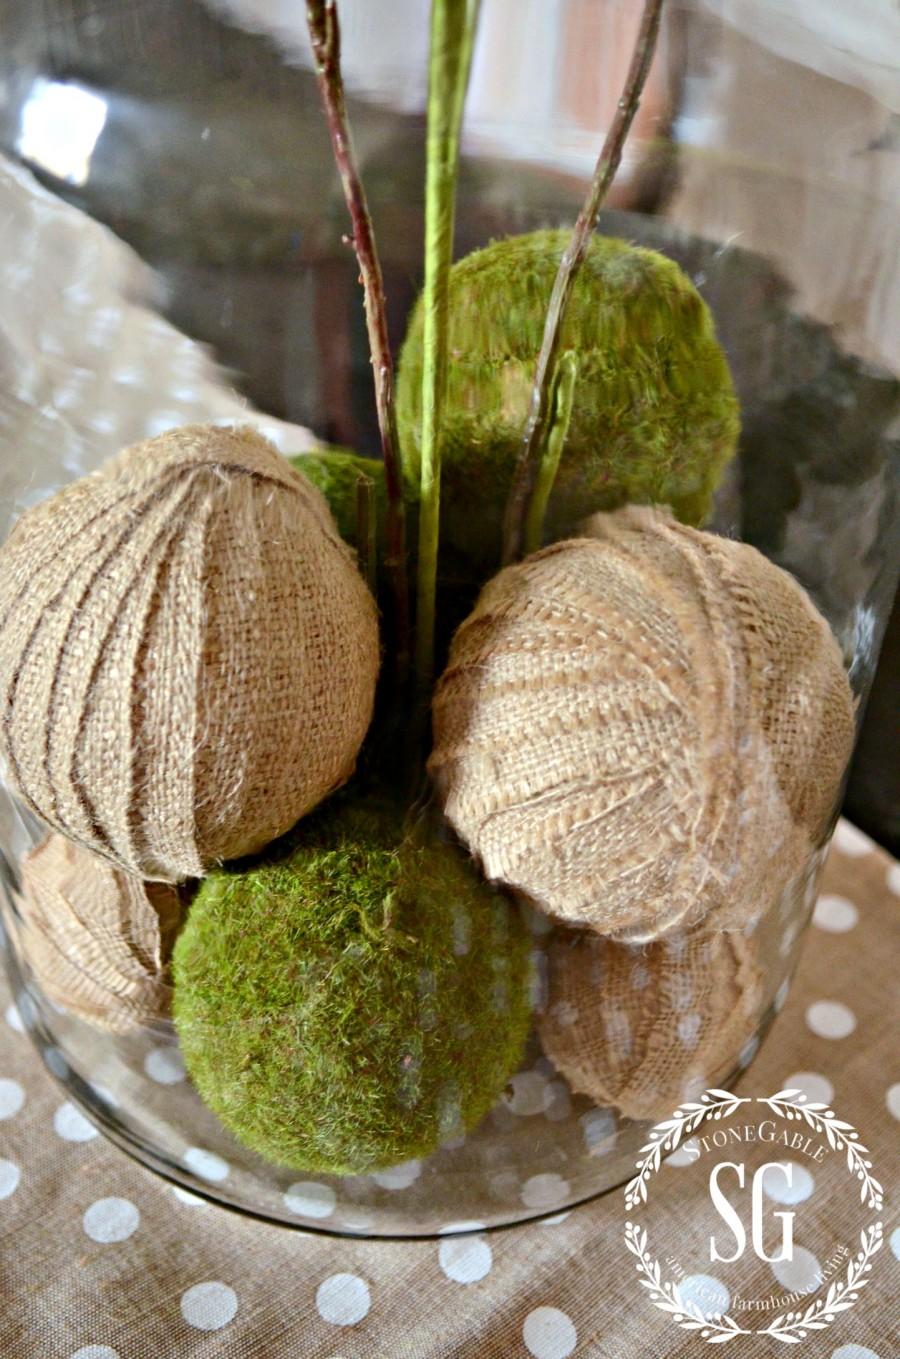 SPRING ISLAND JAR VIGNETTE-burlap and moss balls in jar-stonegableblog.com